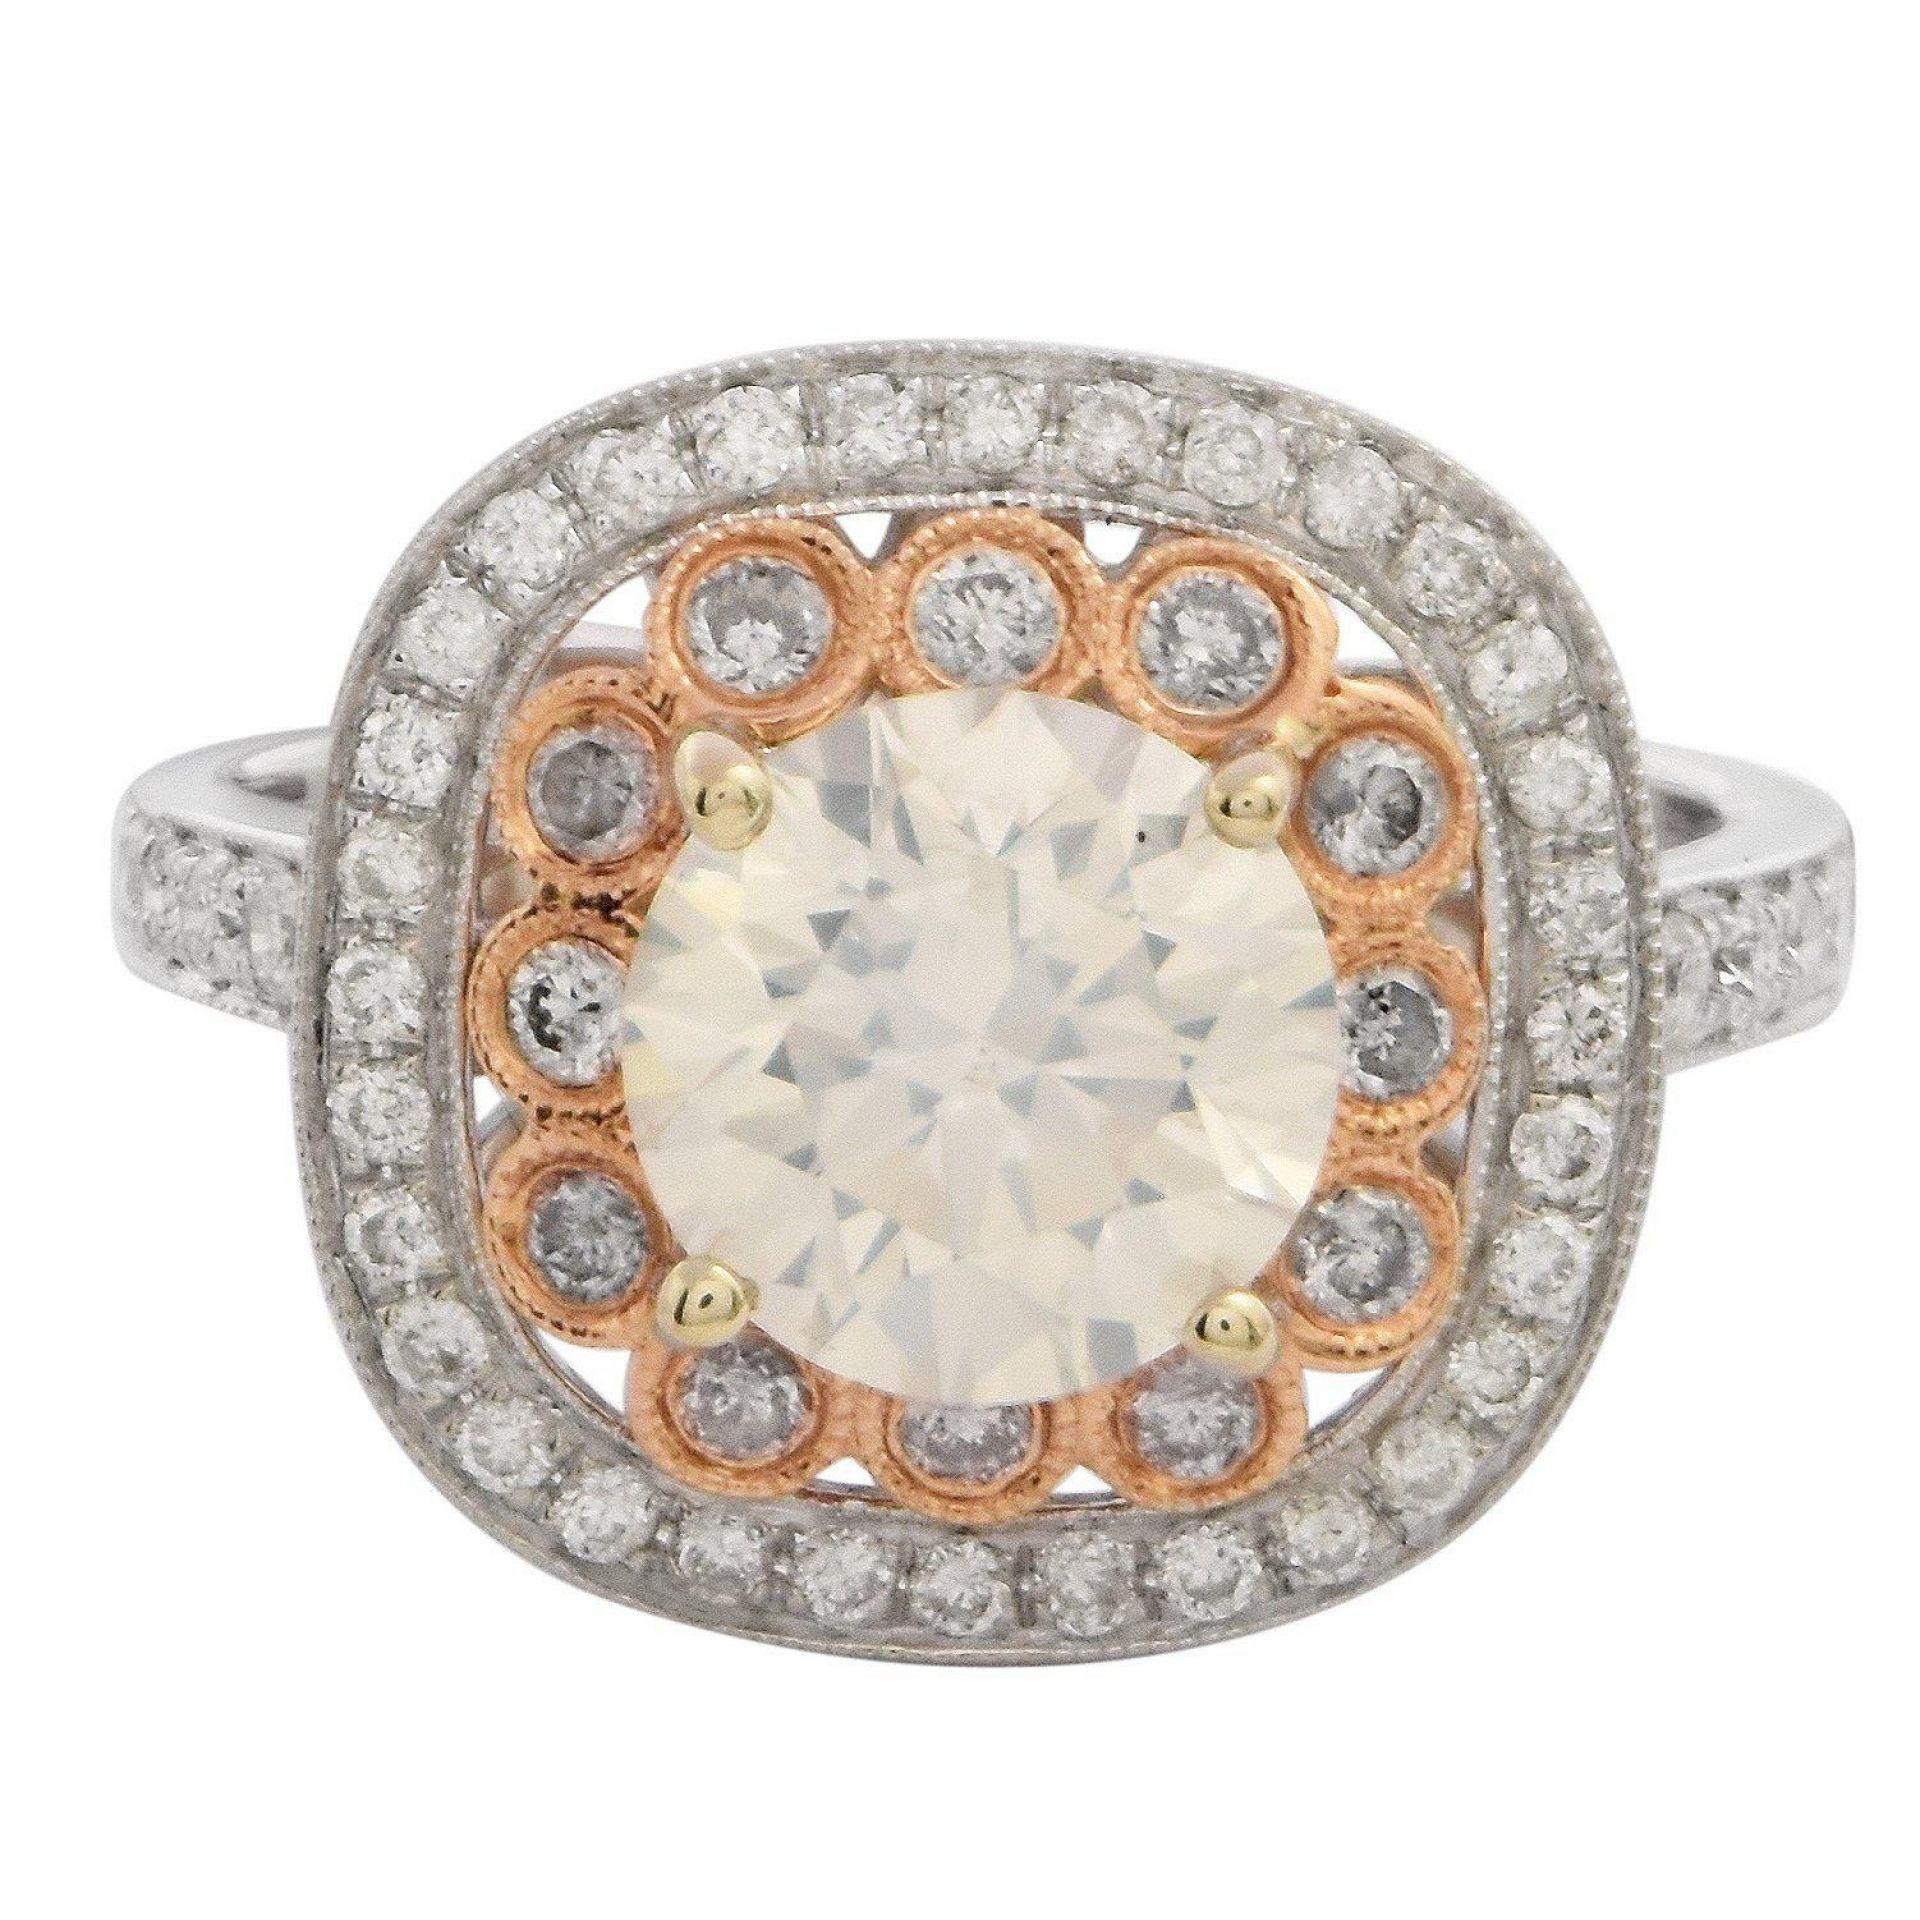 1.77ct SI3 CLARITY CENTER Diamond 18KT White Gold Ring (2.38ctw Diamonds) EGL US